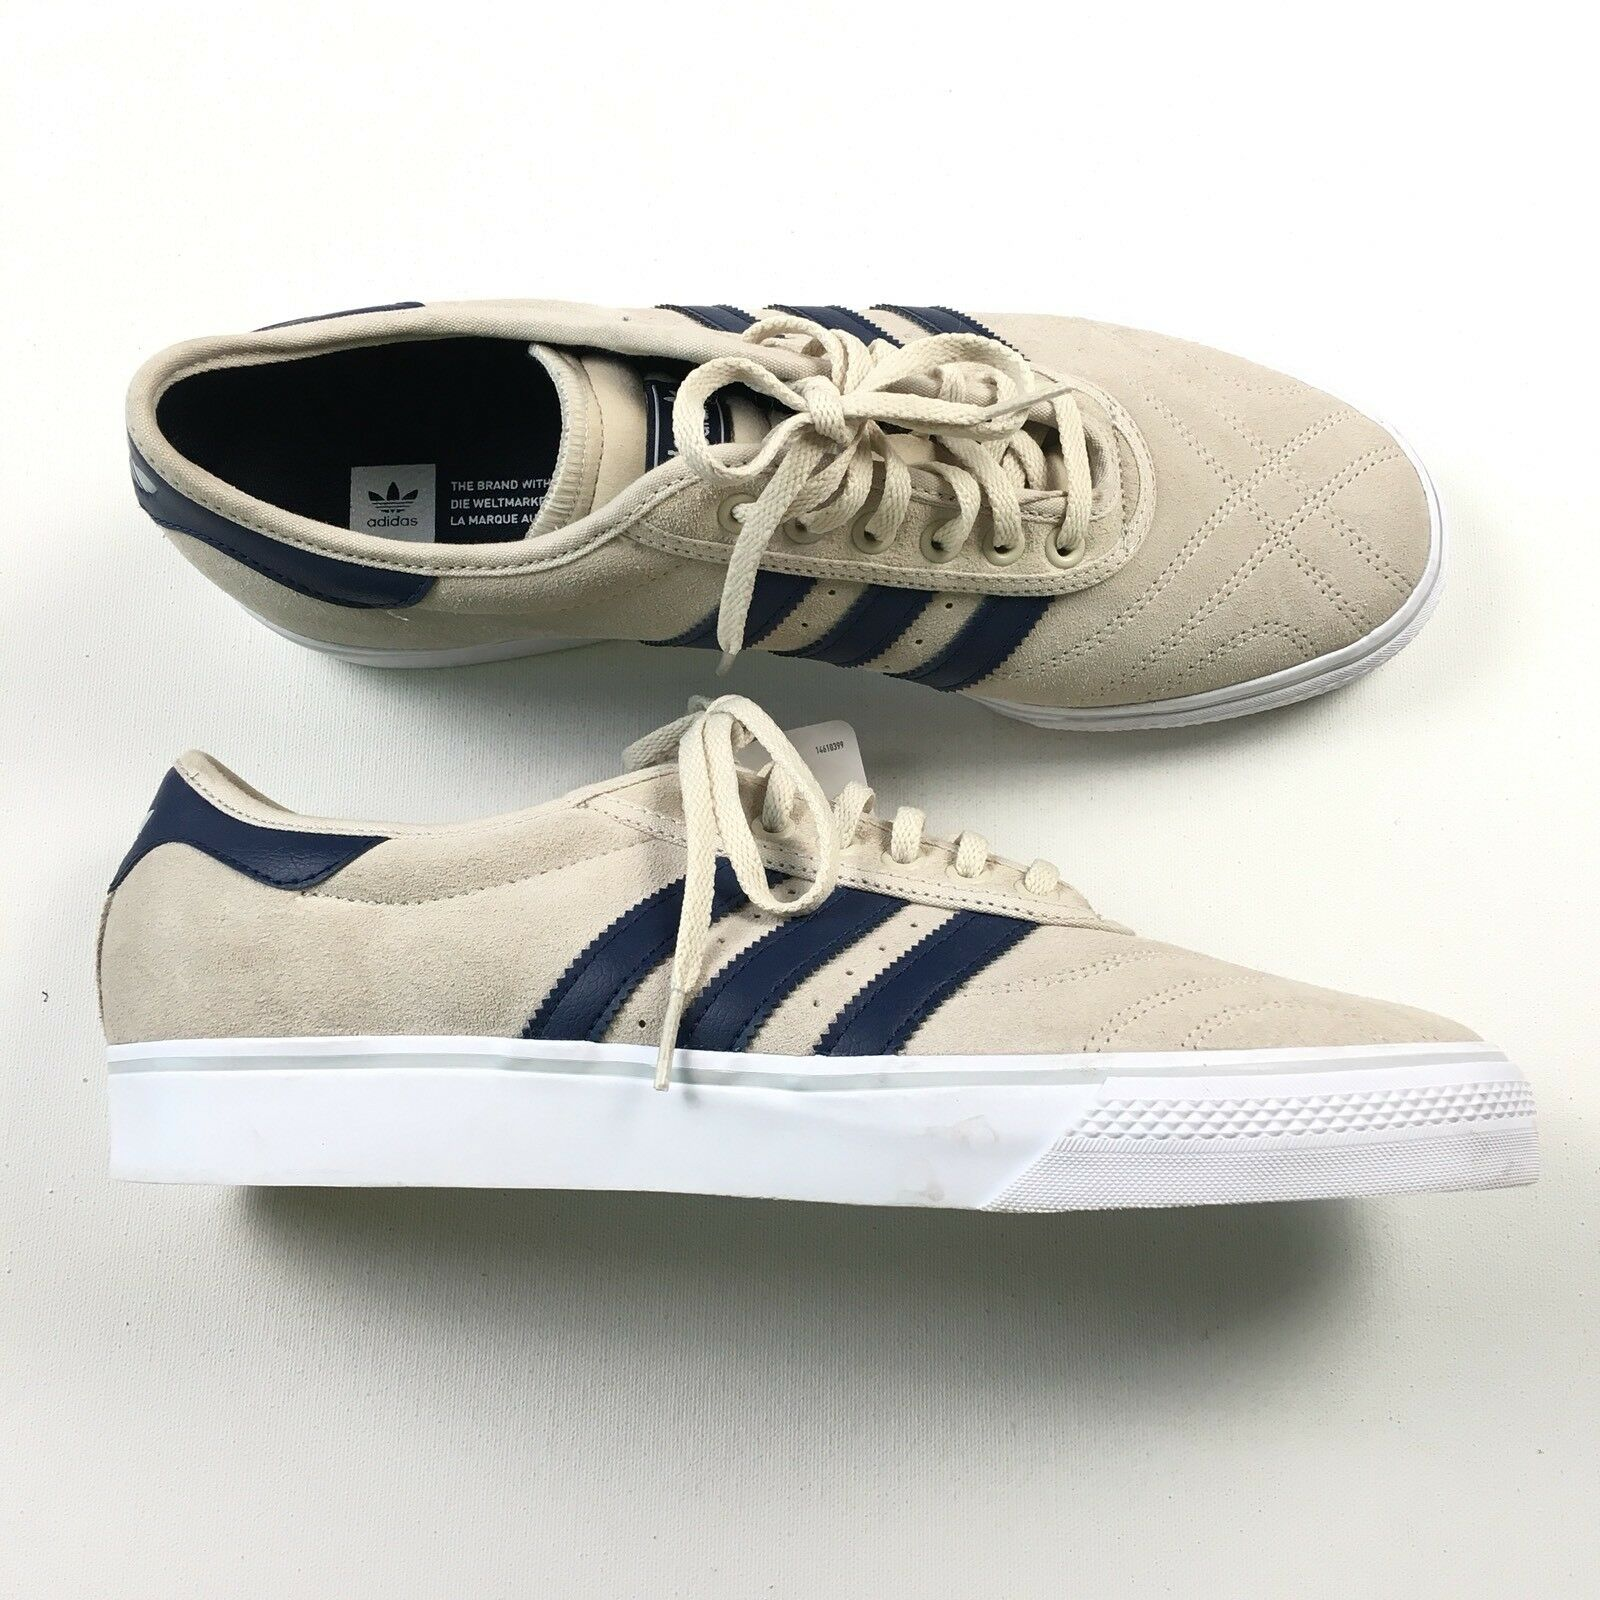 Adidas Uomo by3947 tan skateboard 12 arte by3947 Uomo 12c73c